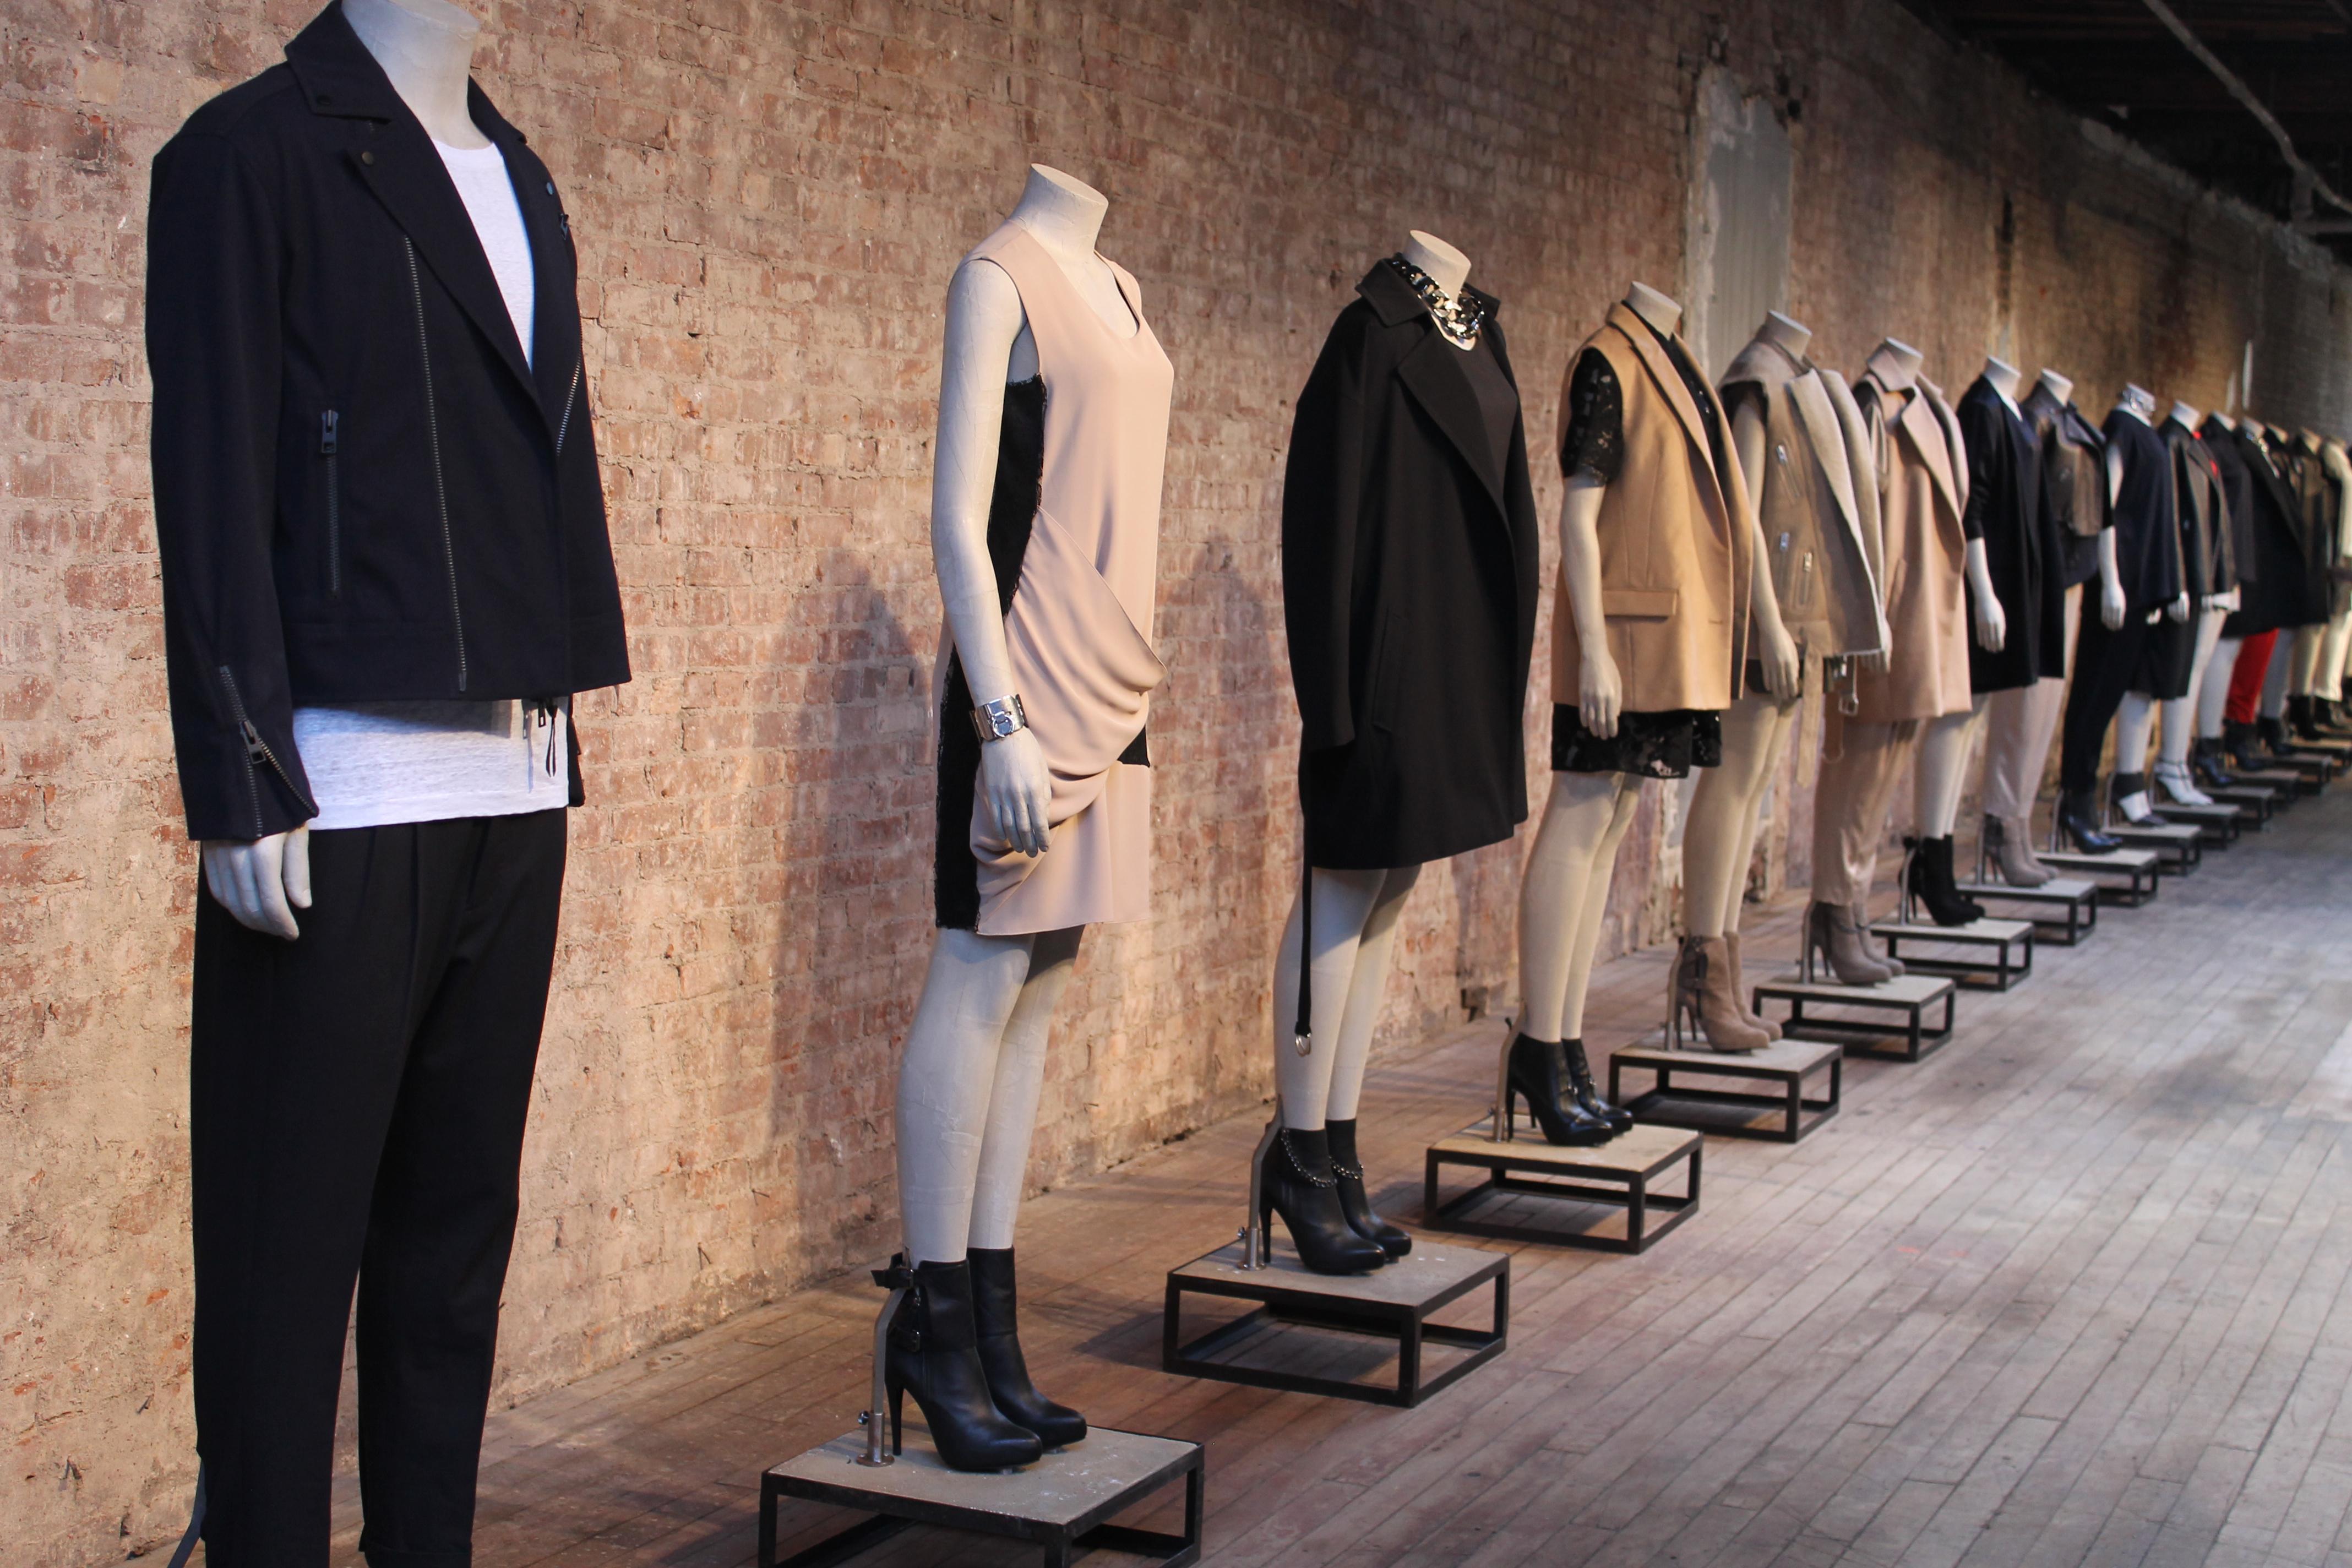 Bombay rayon fashions ltd careers 19